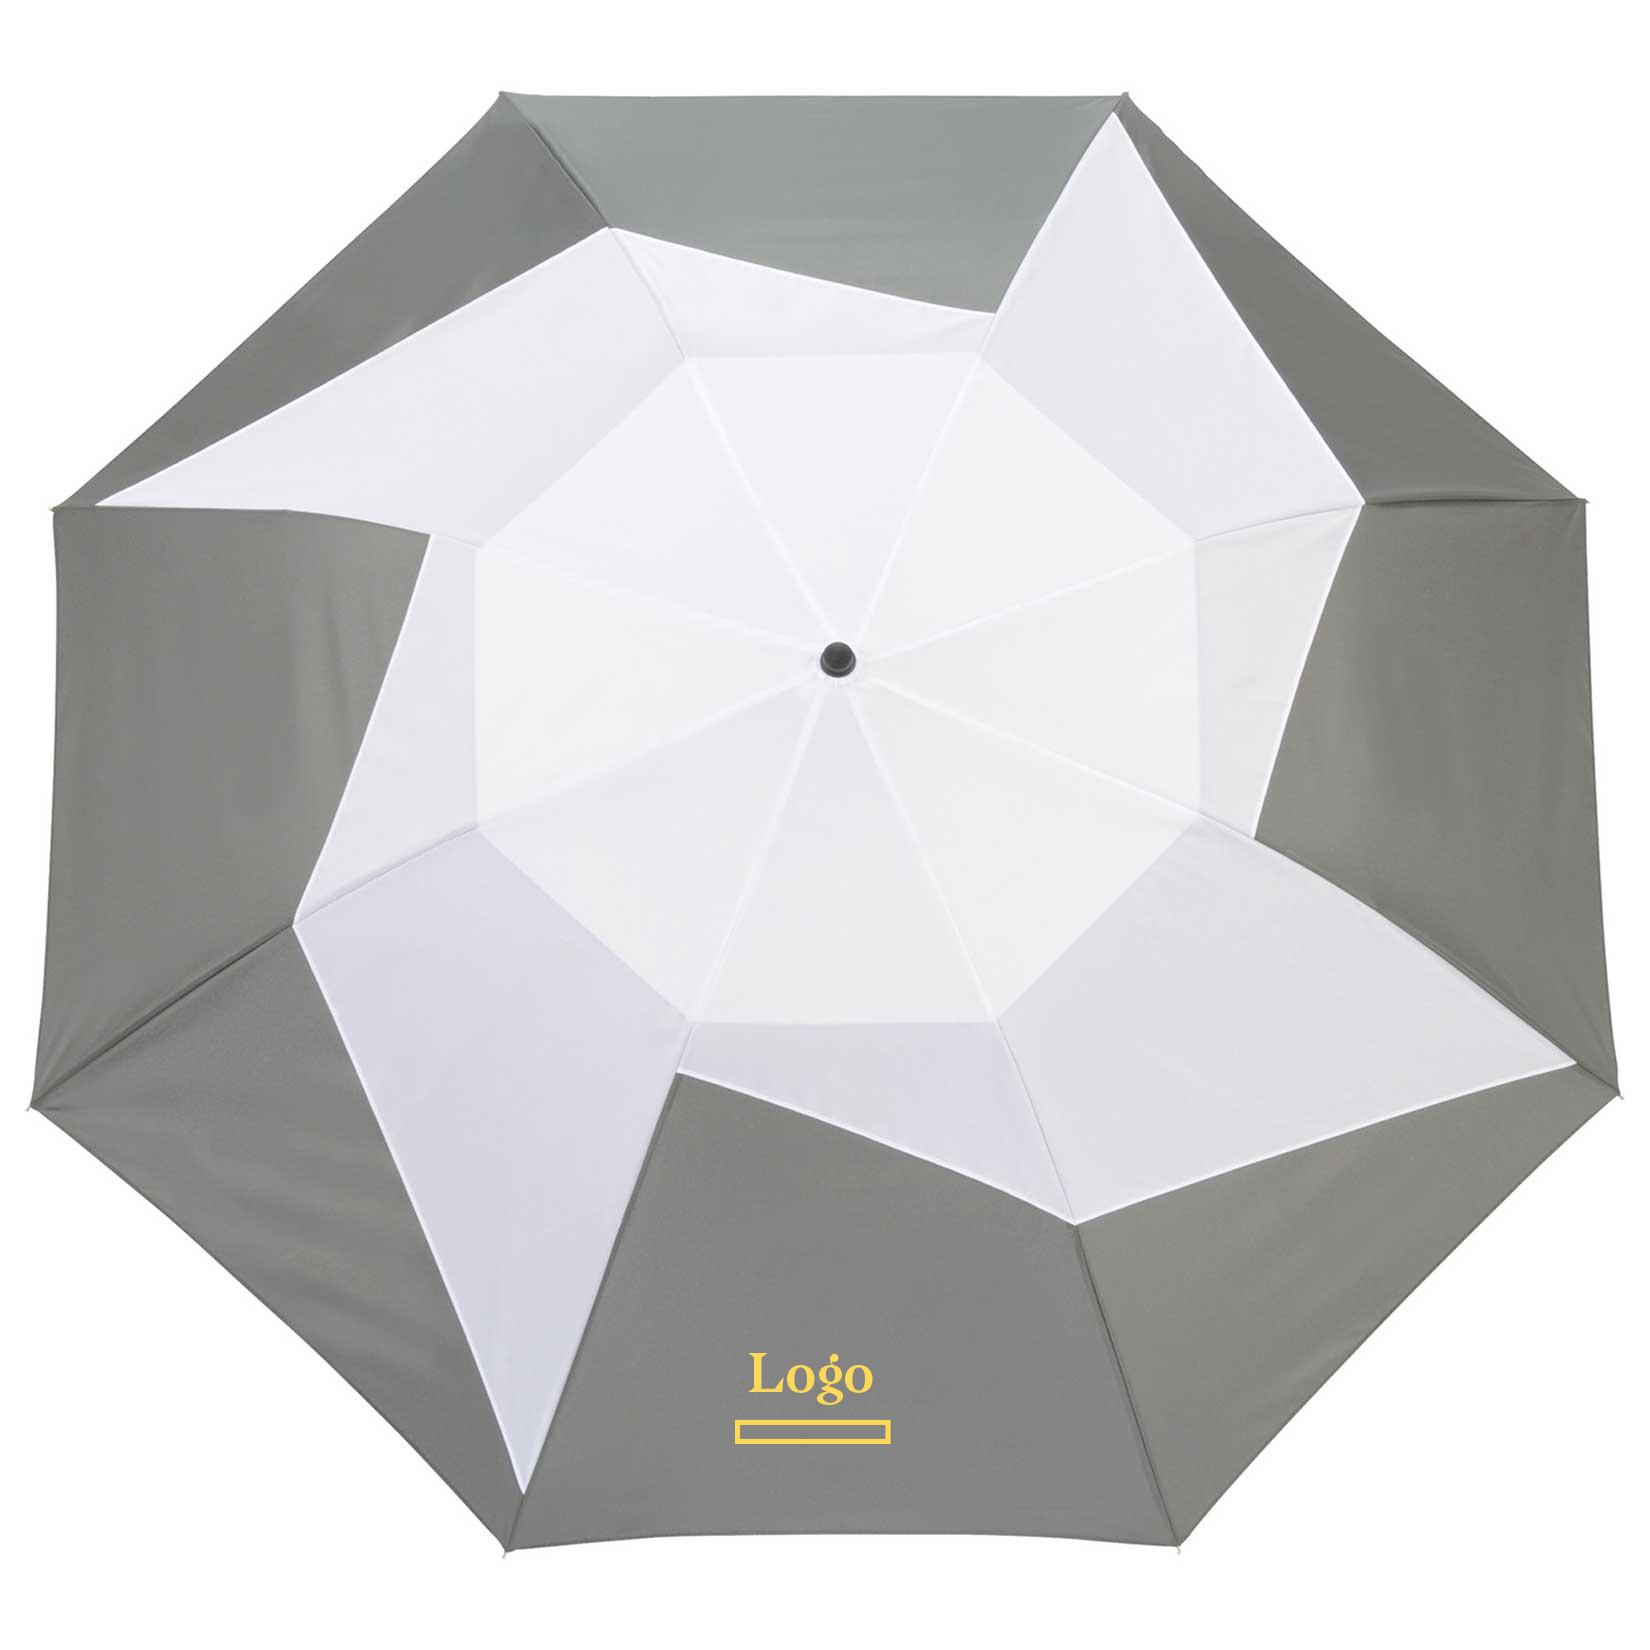 199979 46 pinwheel umbrella one color one location screenprint